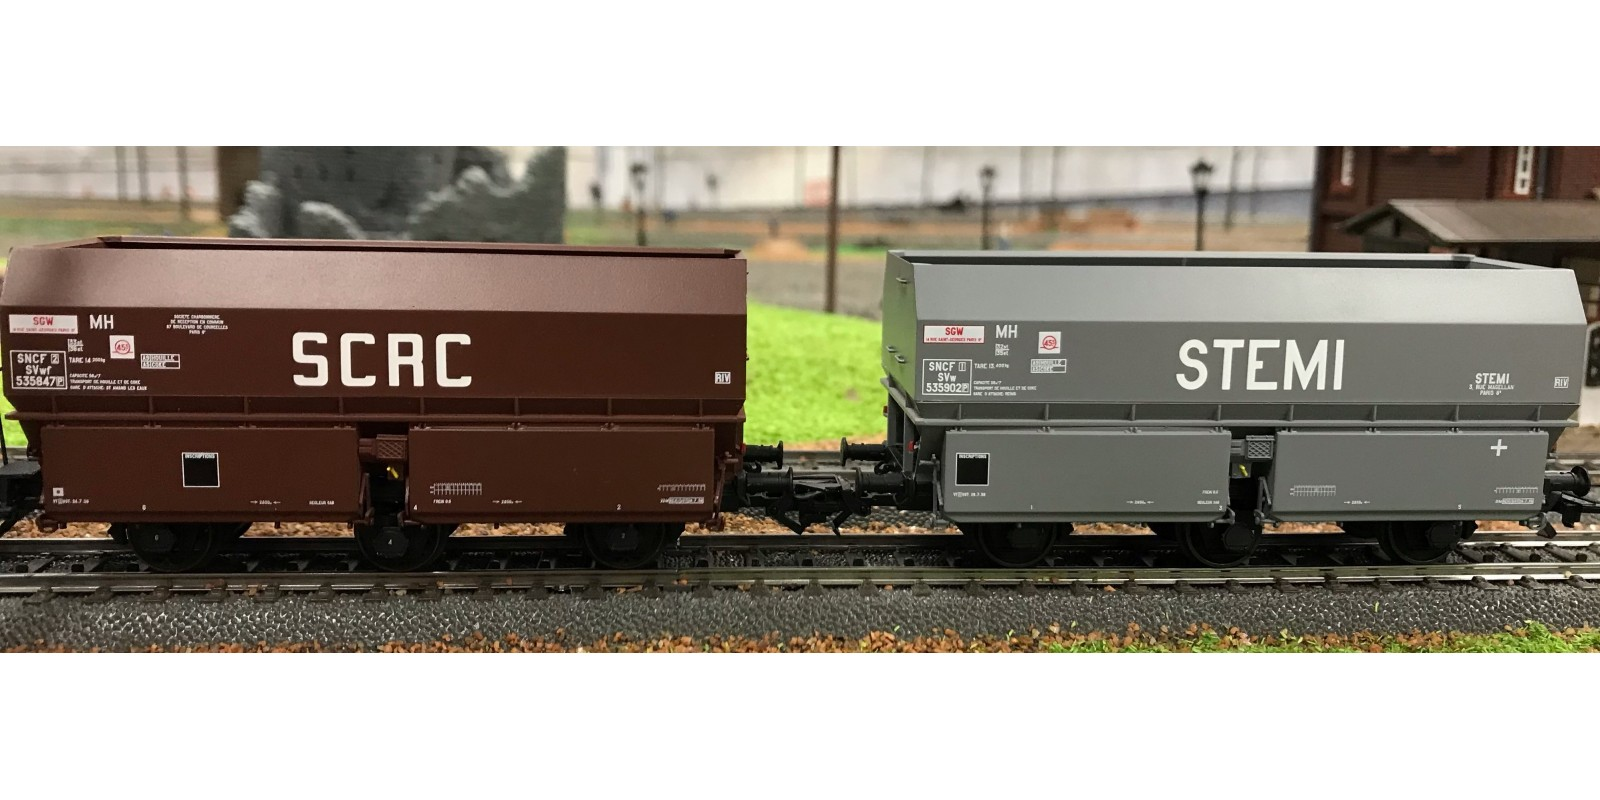 "REWB372 SET of 2 COKE MH45 ""Léonard"" Wheels, 3 axles wheels ""SCRC"" Brown and ""STEMI"" Grey, black Frame Era III"